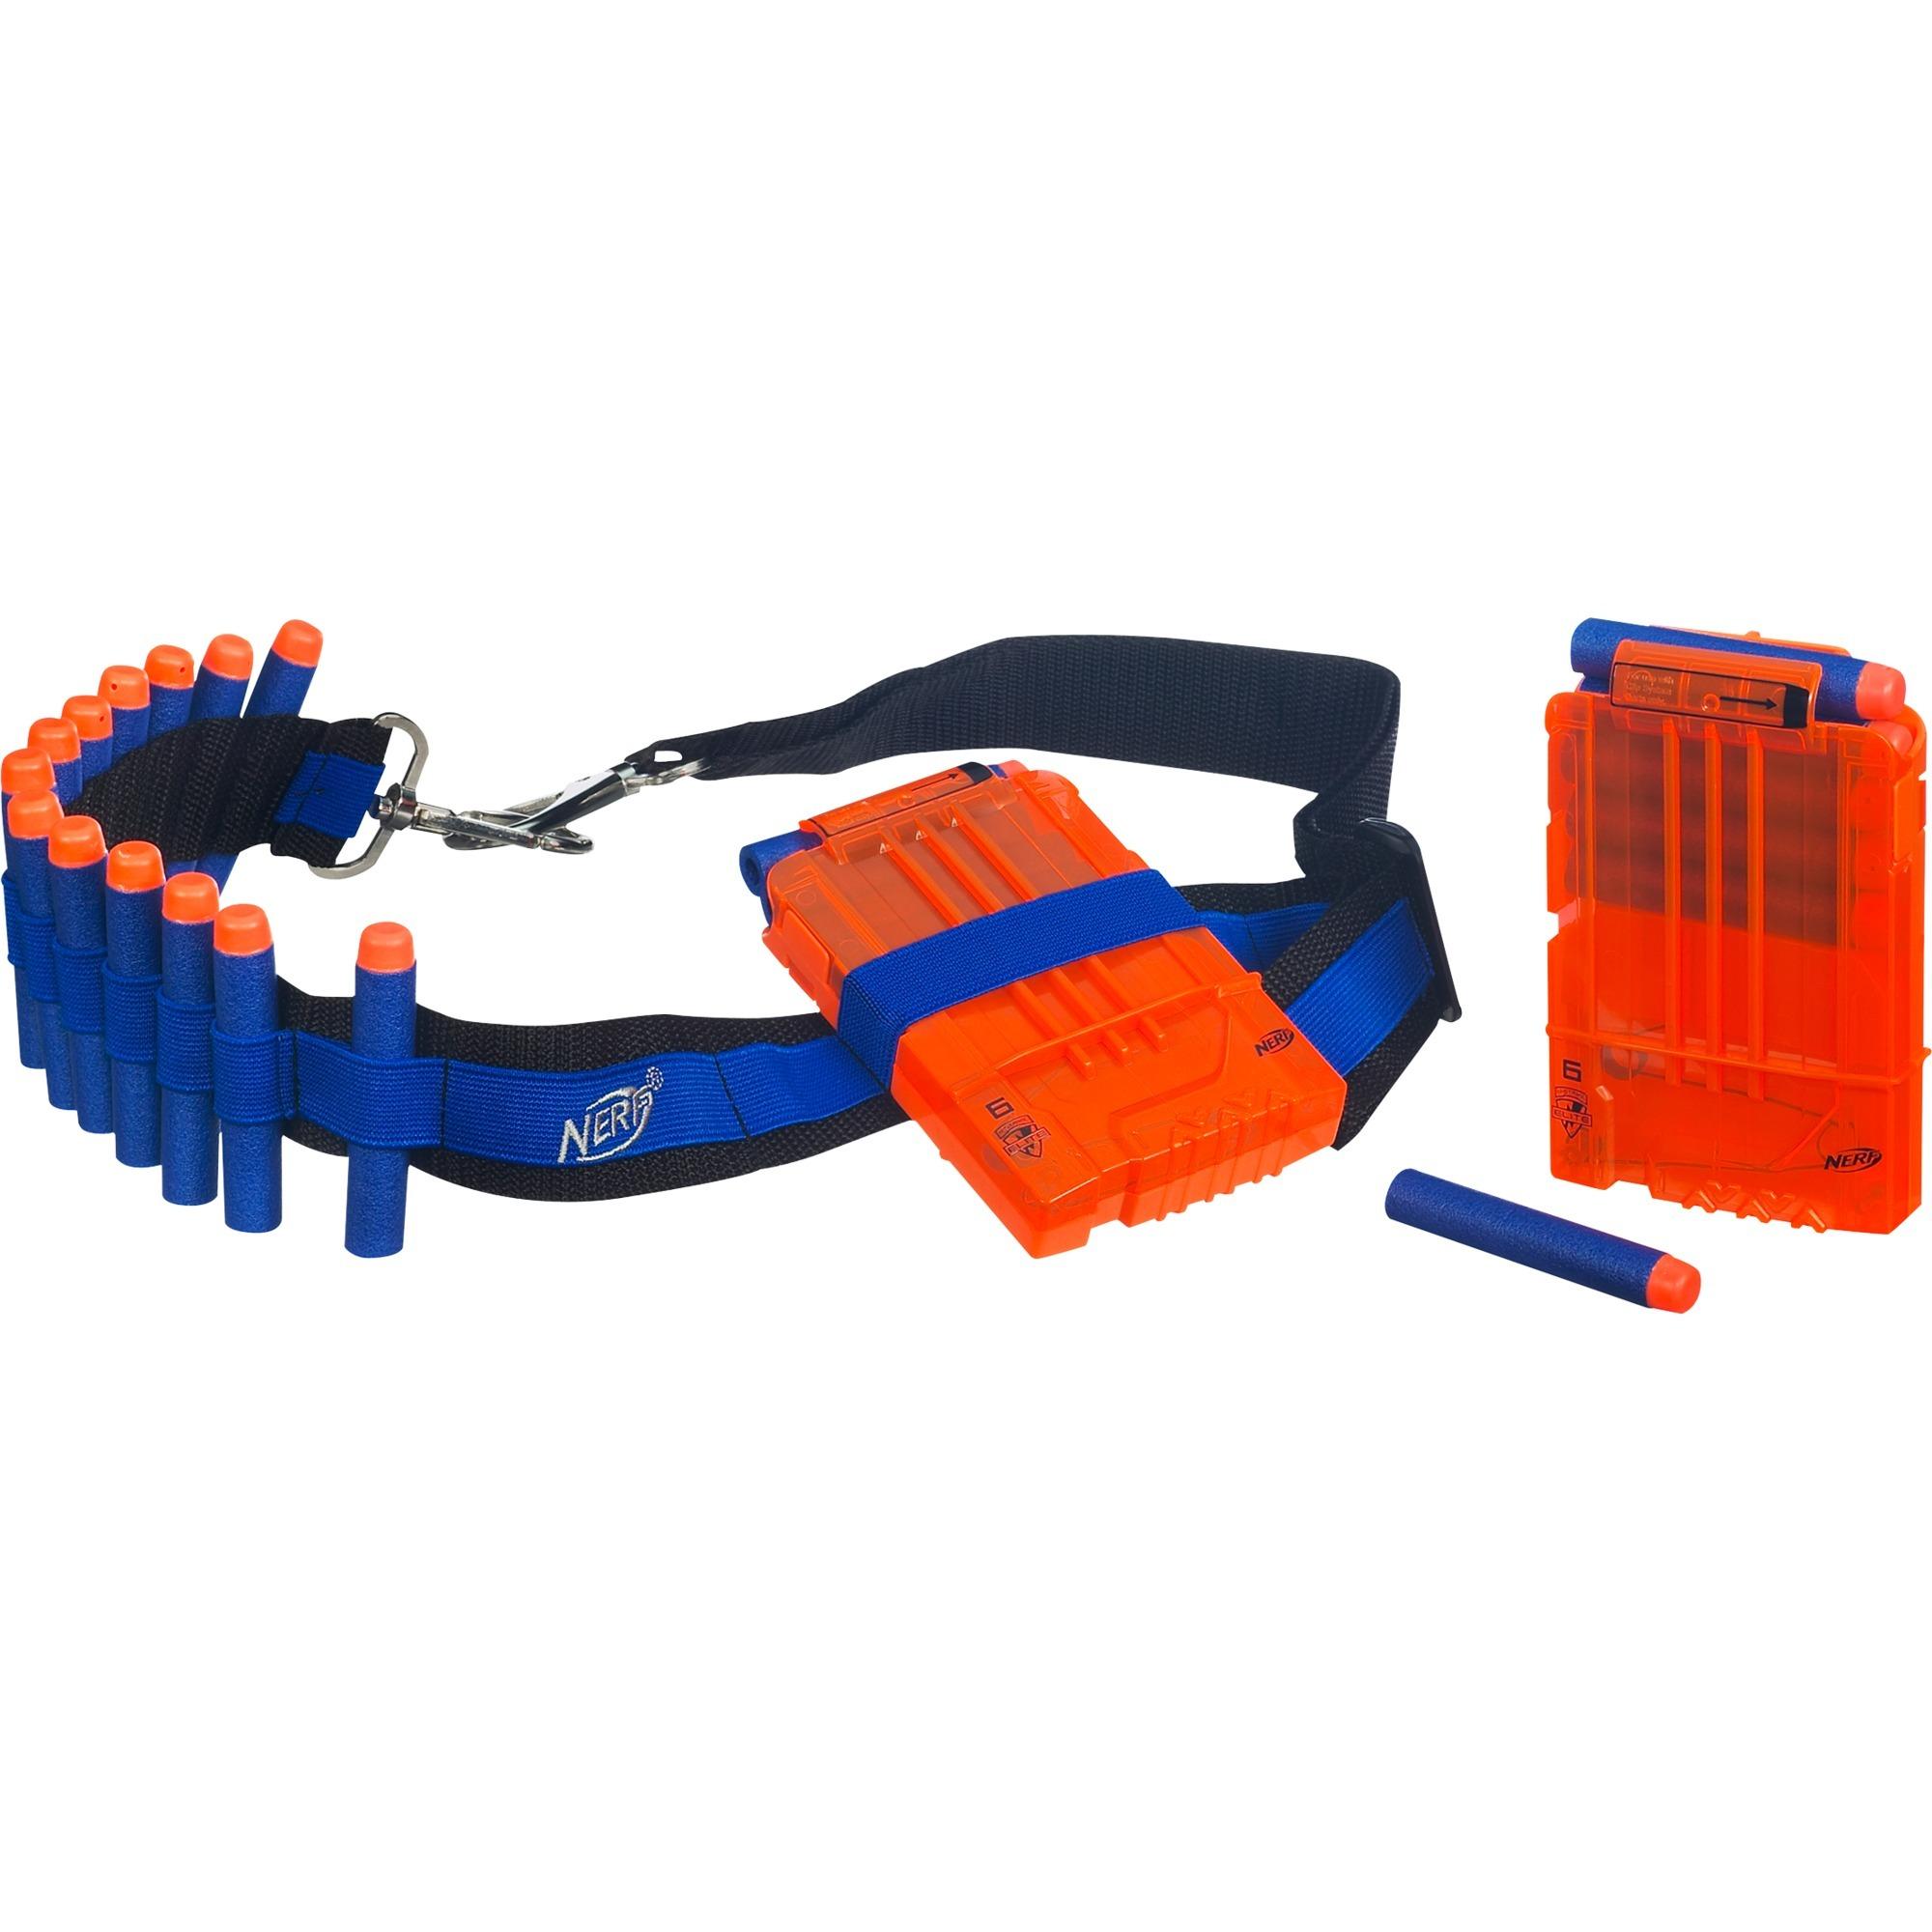 A0090983 Recarga accesorio y consumible para armas de juguete, Pistola Nerf